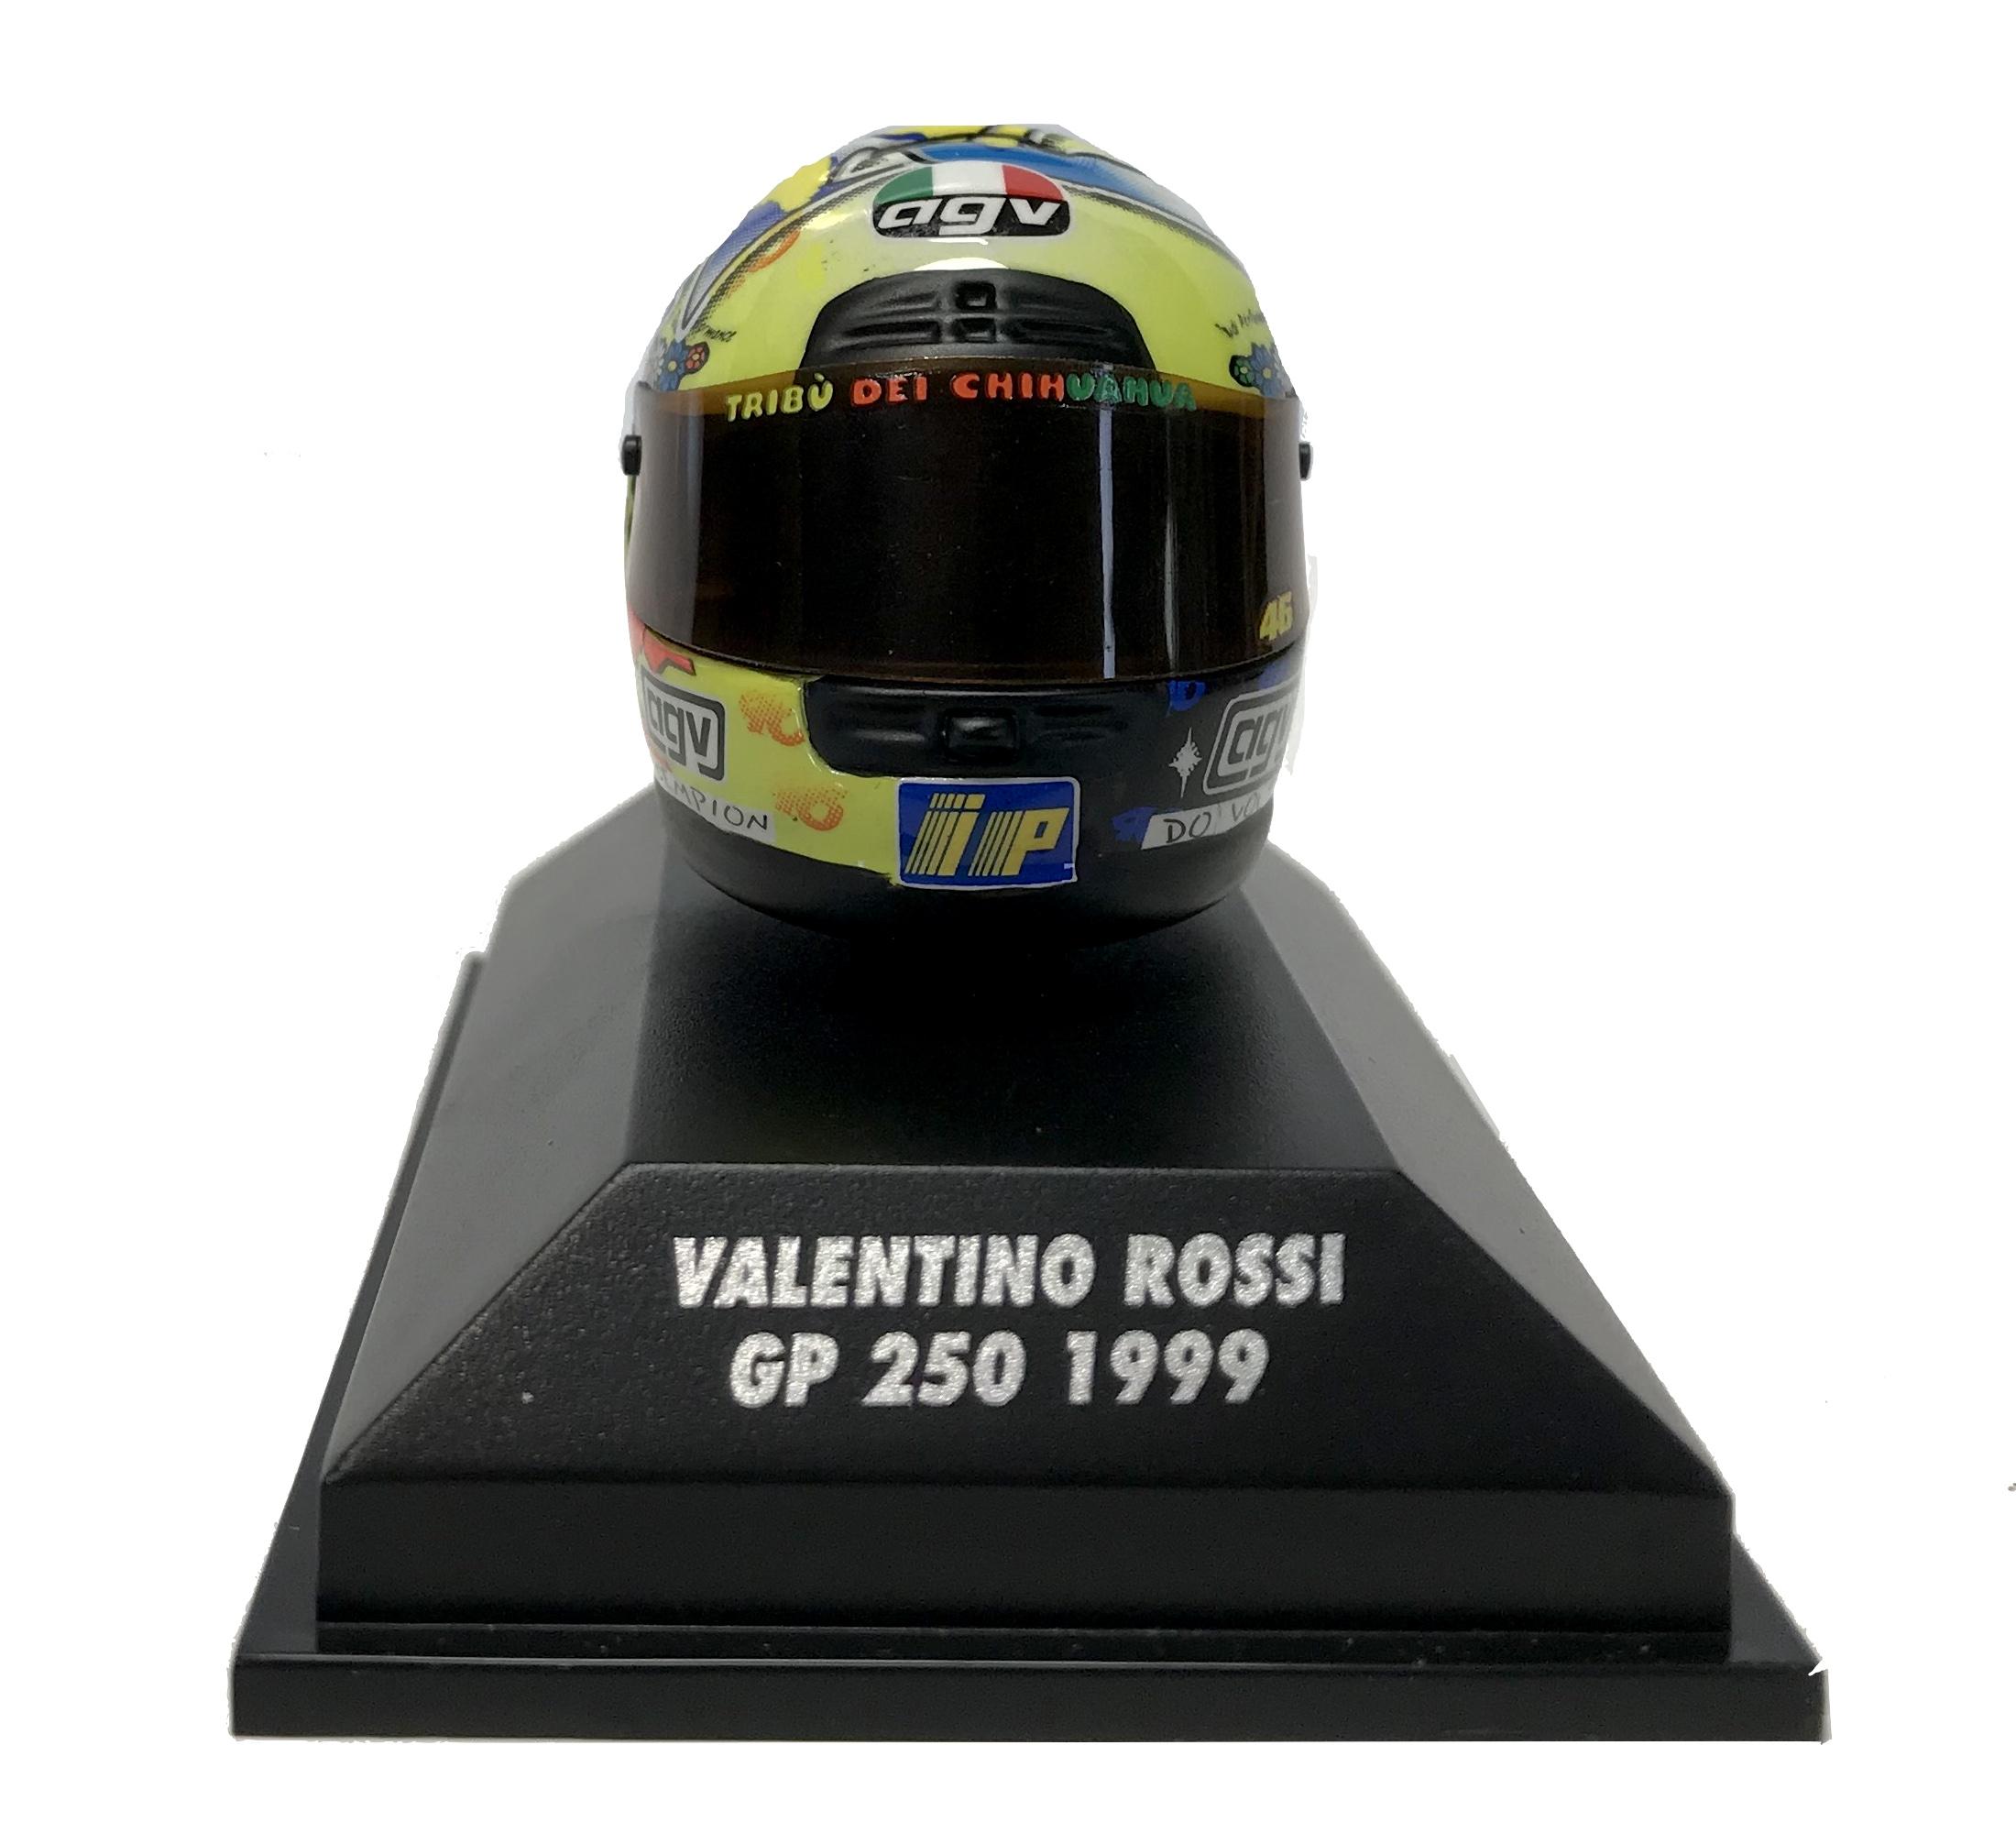 Valentino Rossi GP 250 1999 Helmet 1/8